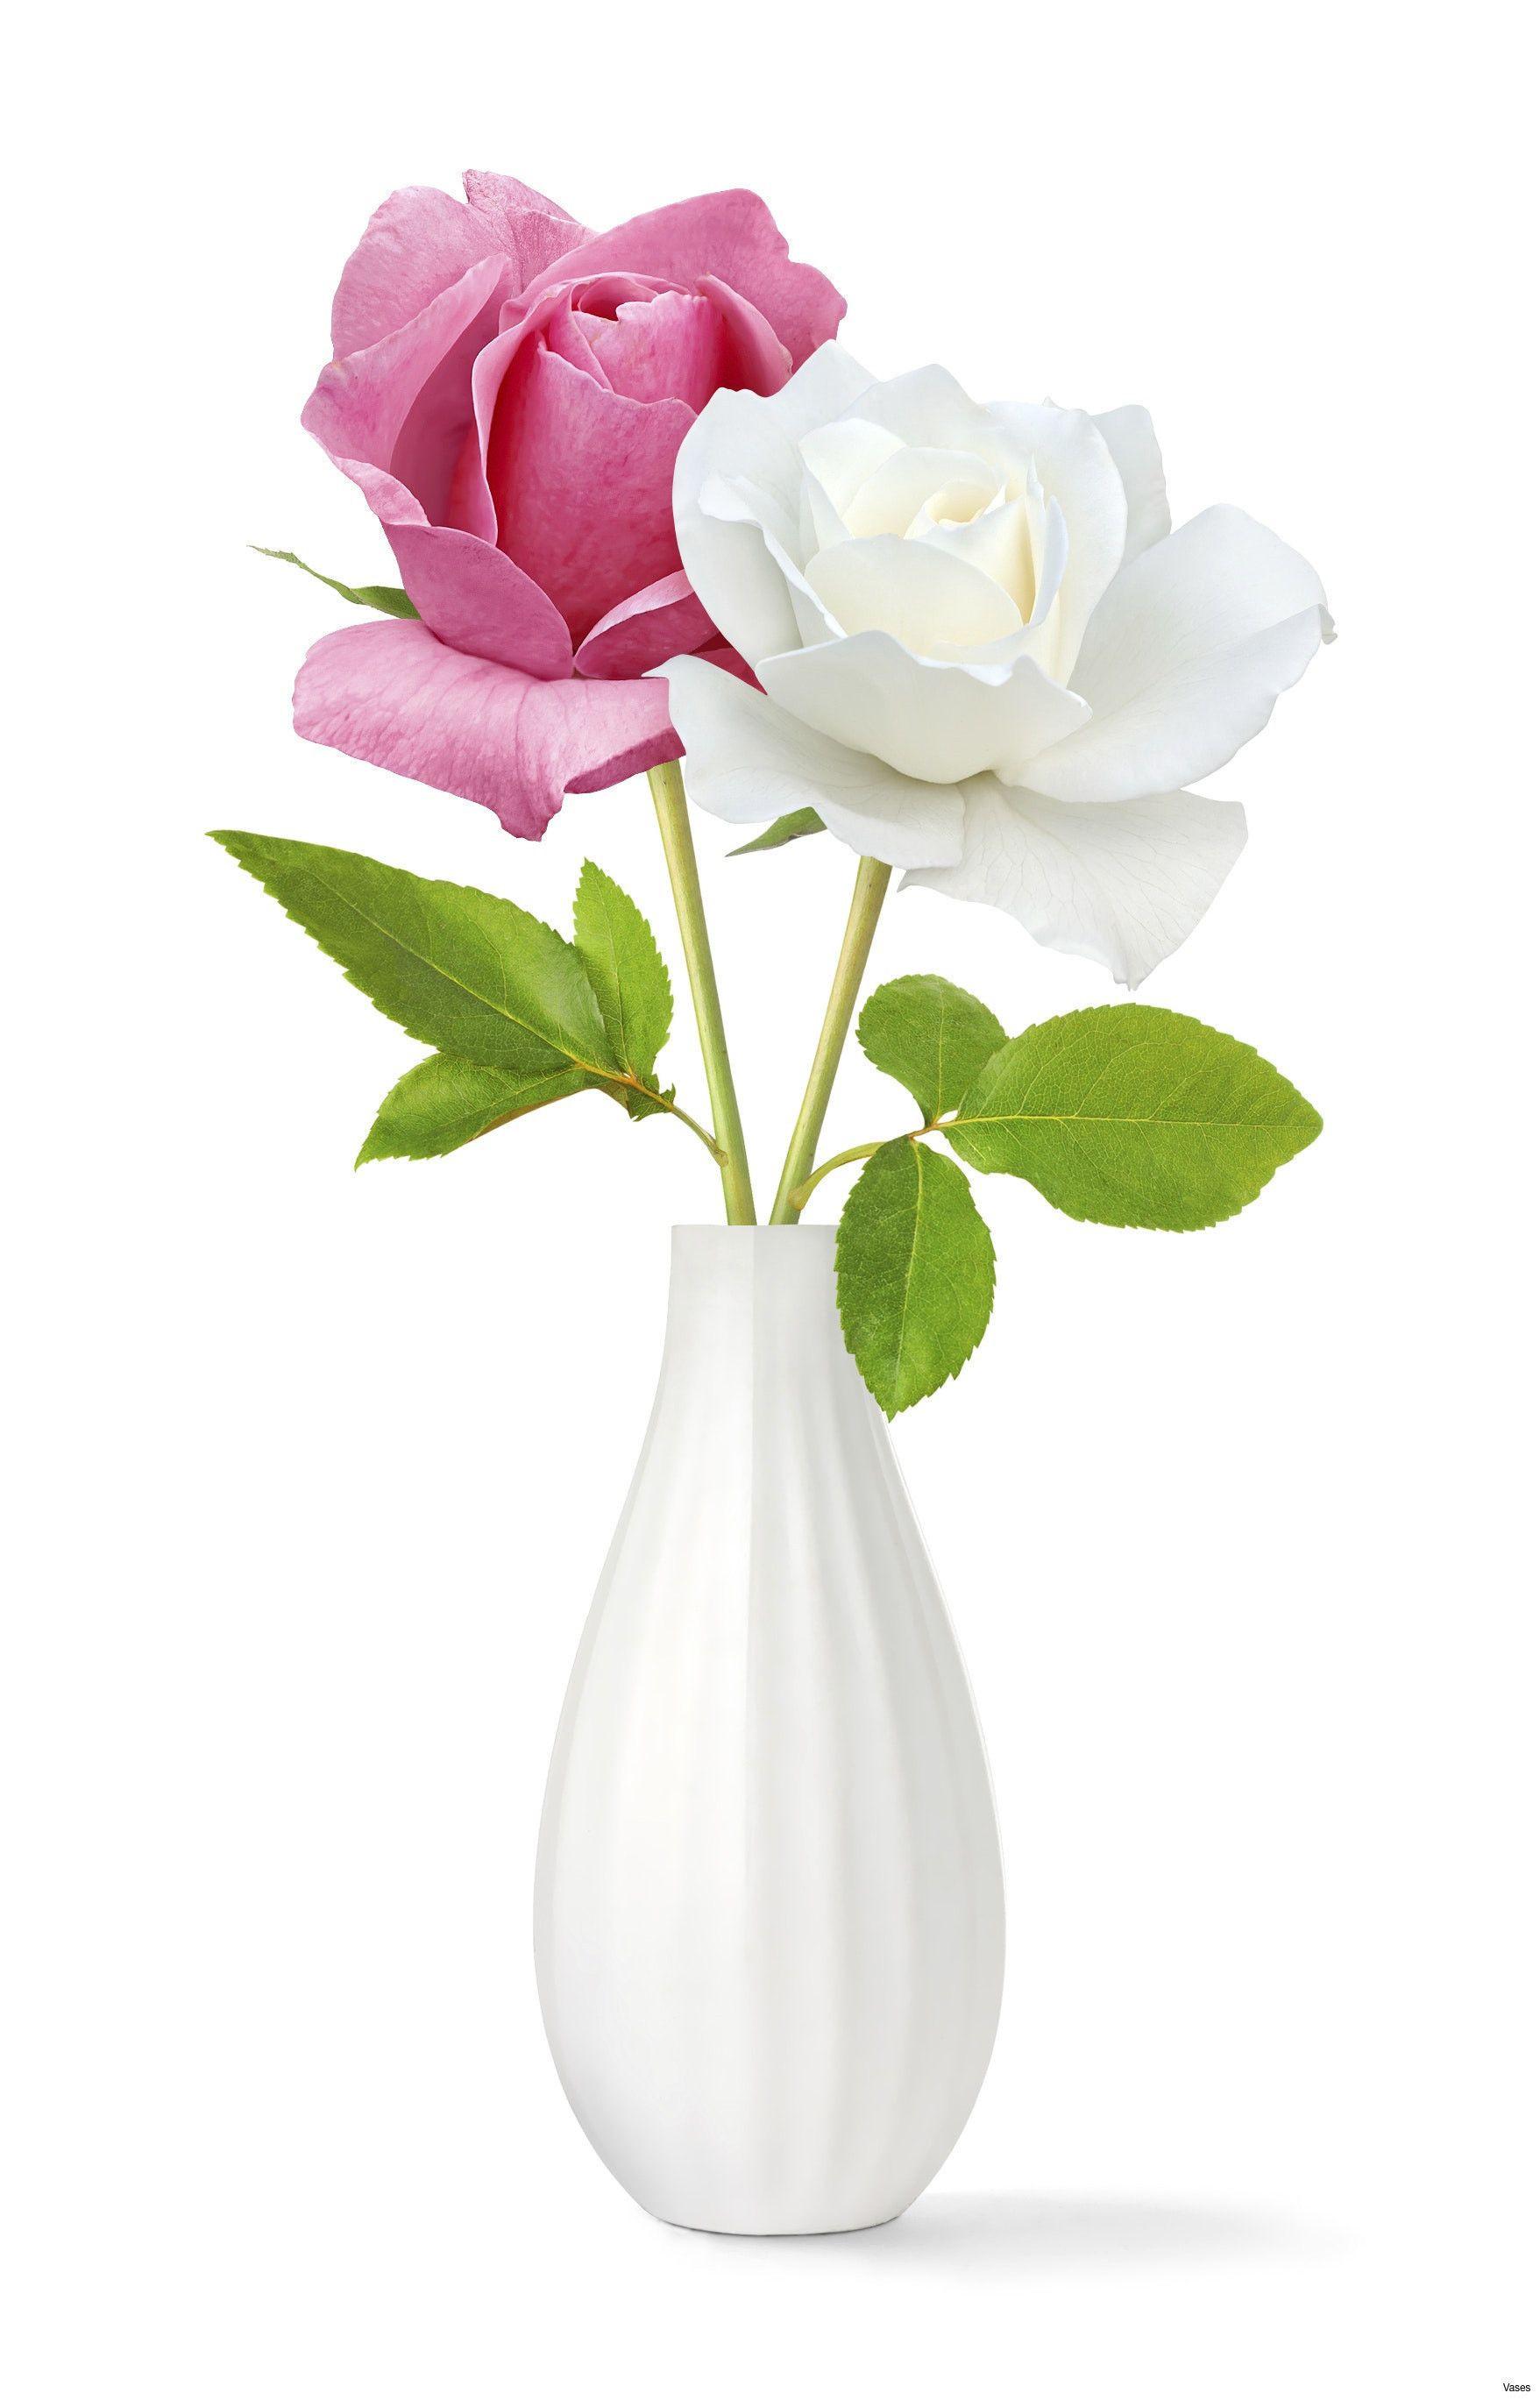 clear colored glass vases of colored glass vase elegant flower vase amazing cool vases flower inside colored glass vase elegant flower vase amazing cool vases flower vase coloring page